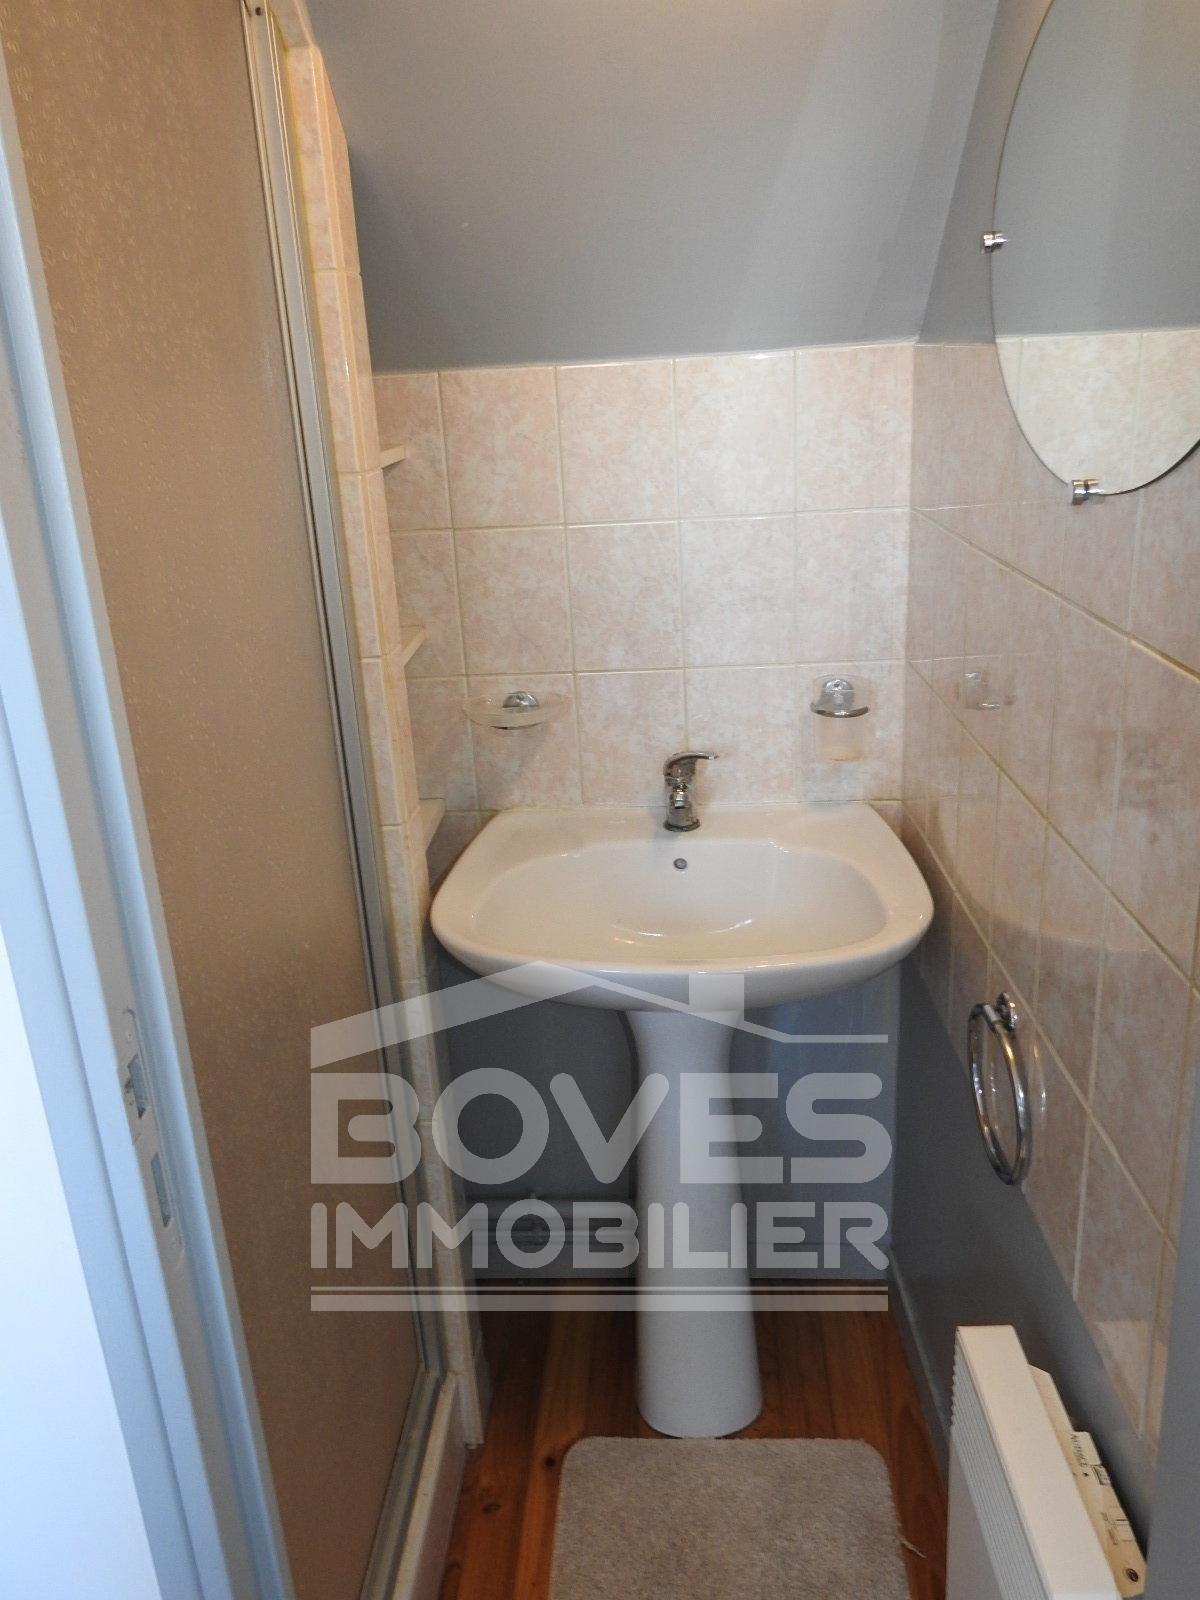 Appartement DUPLEX T2 80440 BOVES